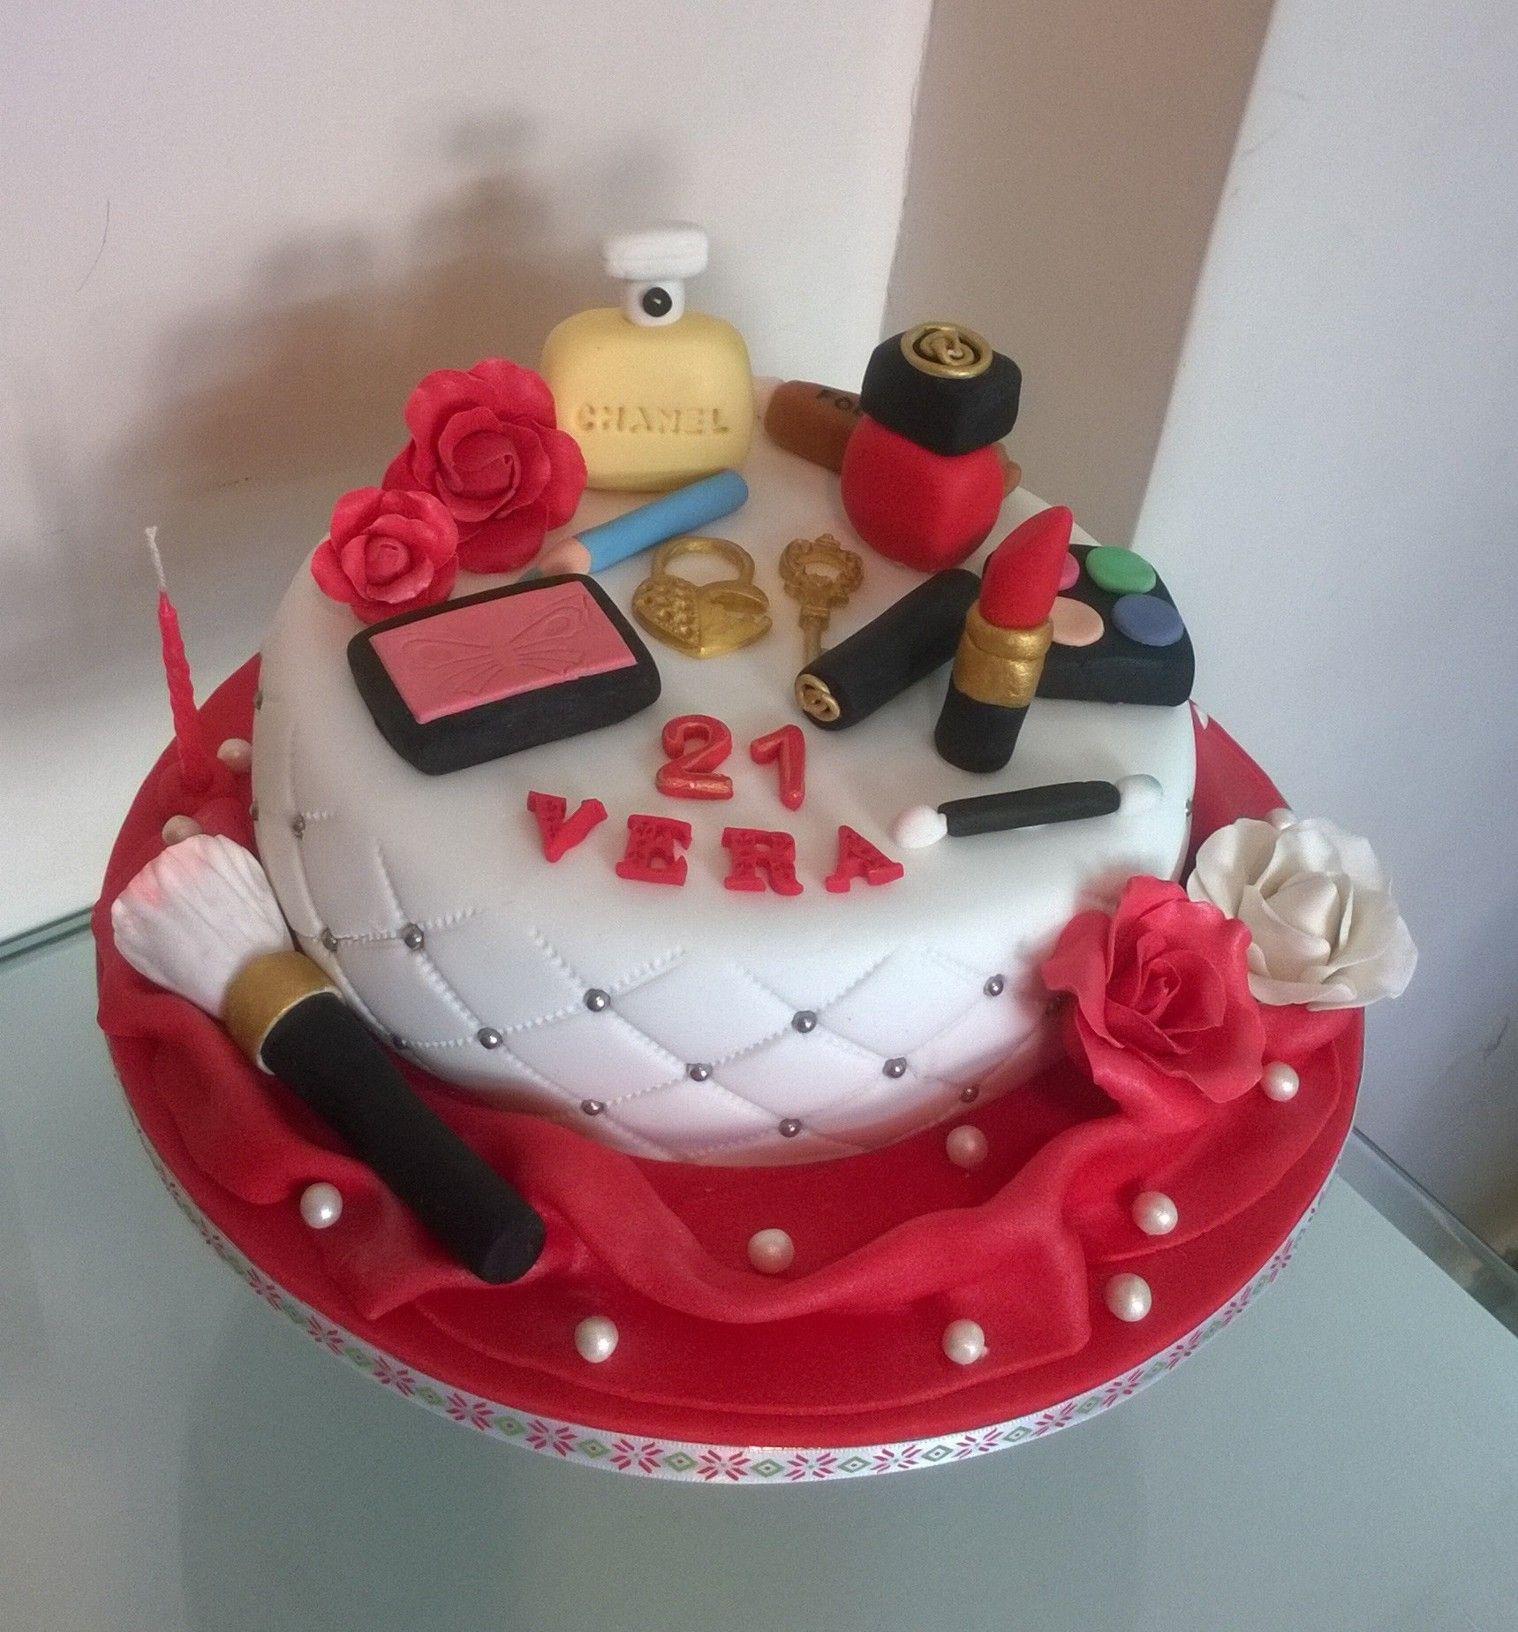 Vera's 21st Birthday Makeup Cake 28.1.17 For 15.1.17 2.8kg